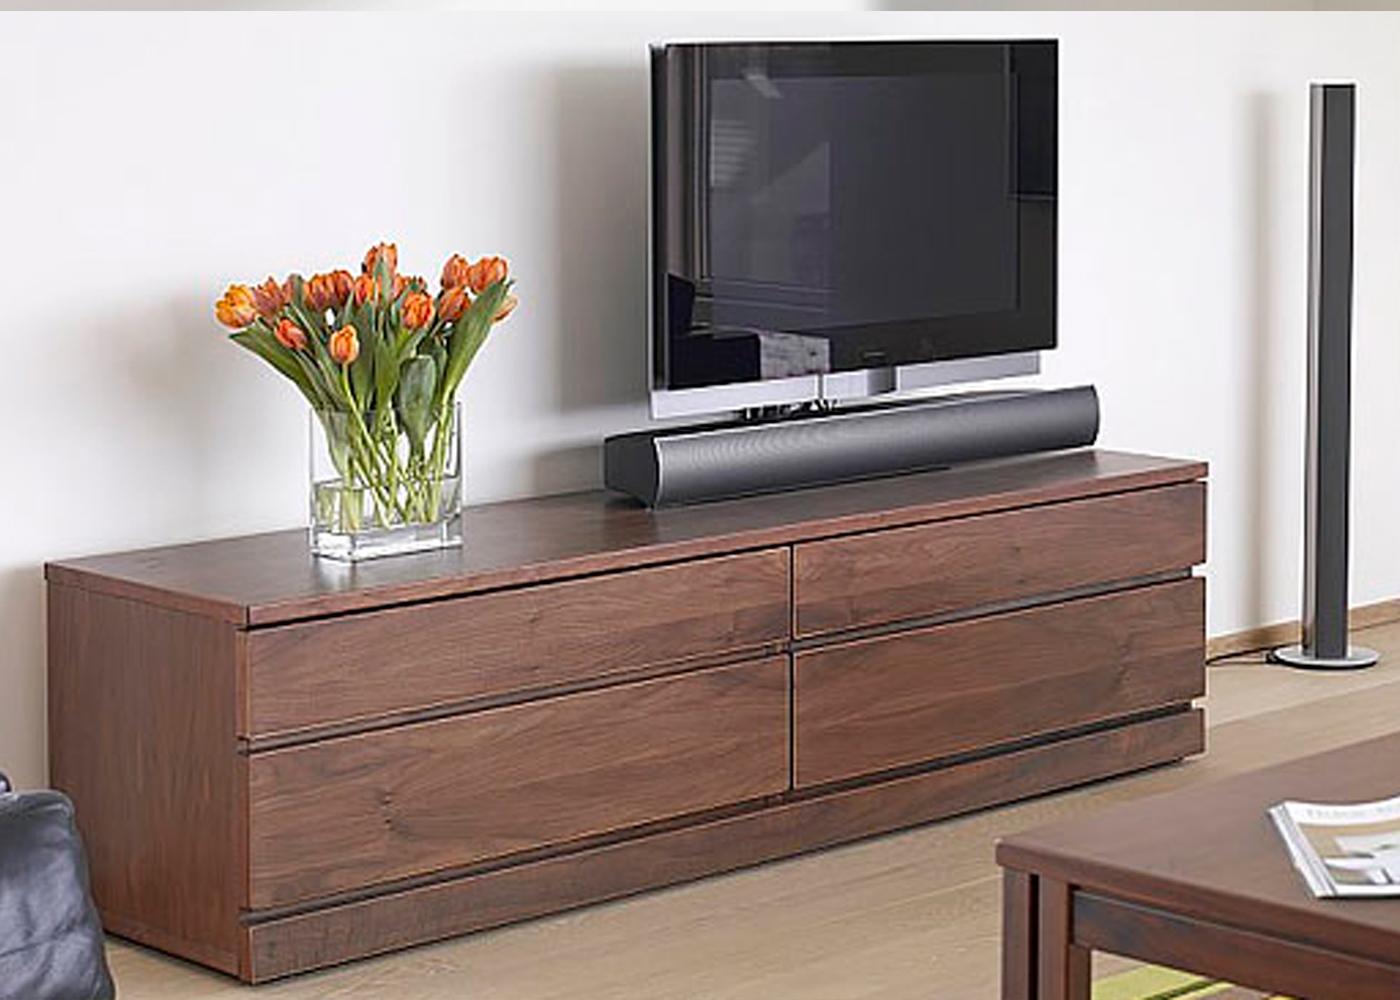 Skovby Sm87 Tv Cabinet In Walnut Finish 1 – Midfurn Regarding Tv Stands Cabinets (View 6 of 15)